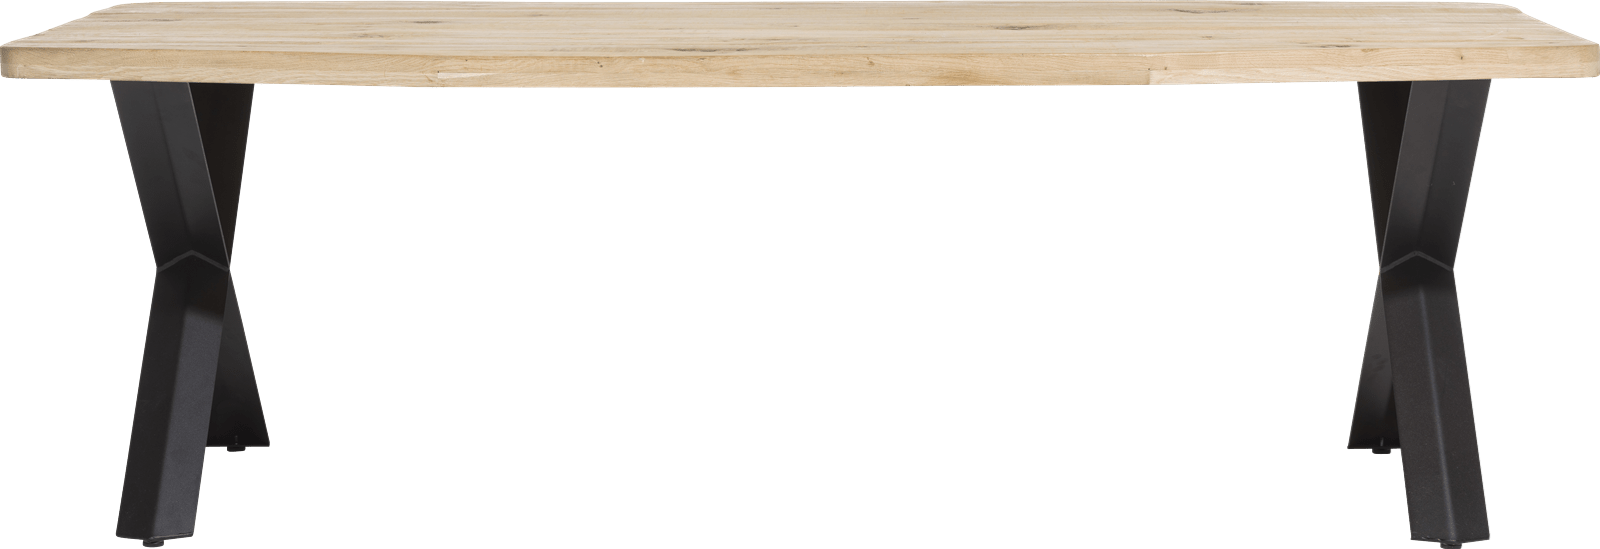 Maddox - eetkamertafel 250 x 100 cm - hout - x-poot